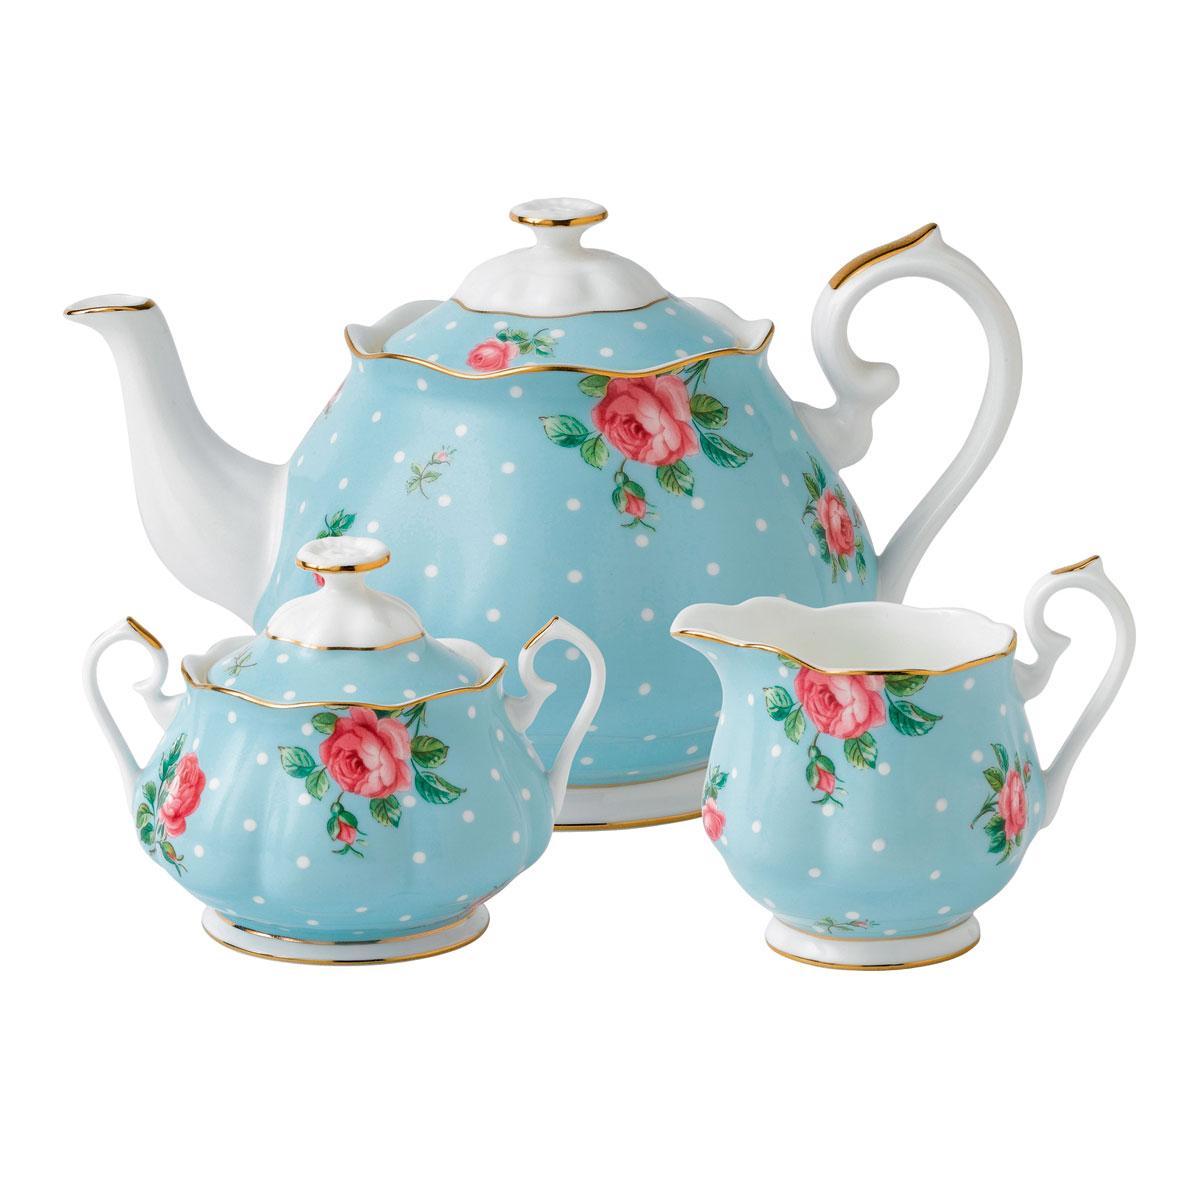 Royal Albert China Polka Blue 3 Piece Teaset - Teapot, Sugar, Creamer